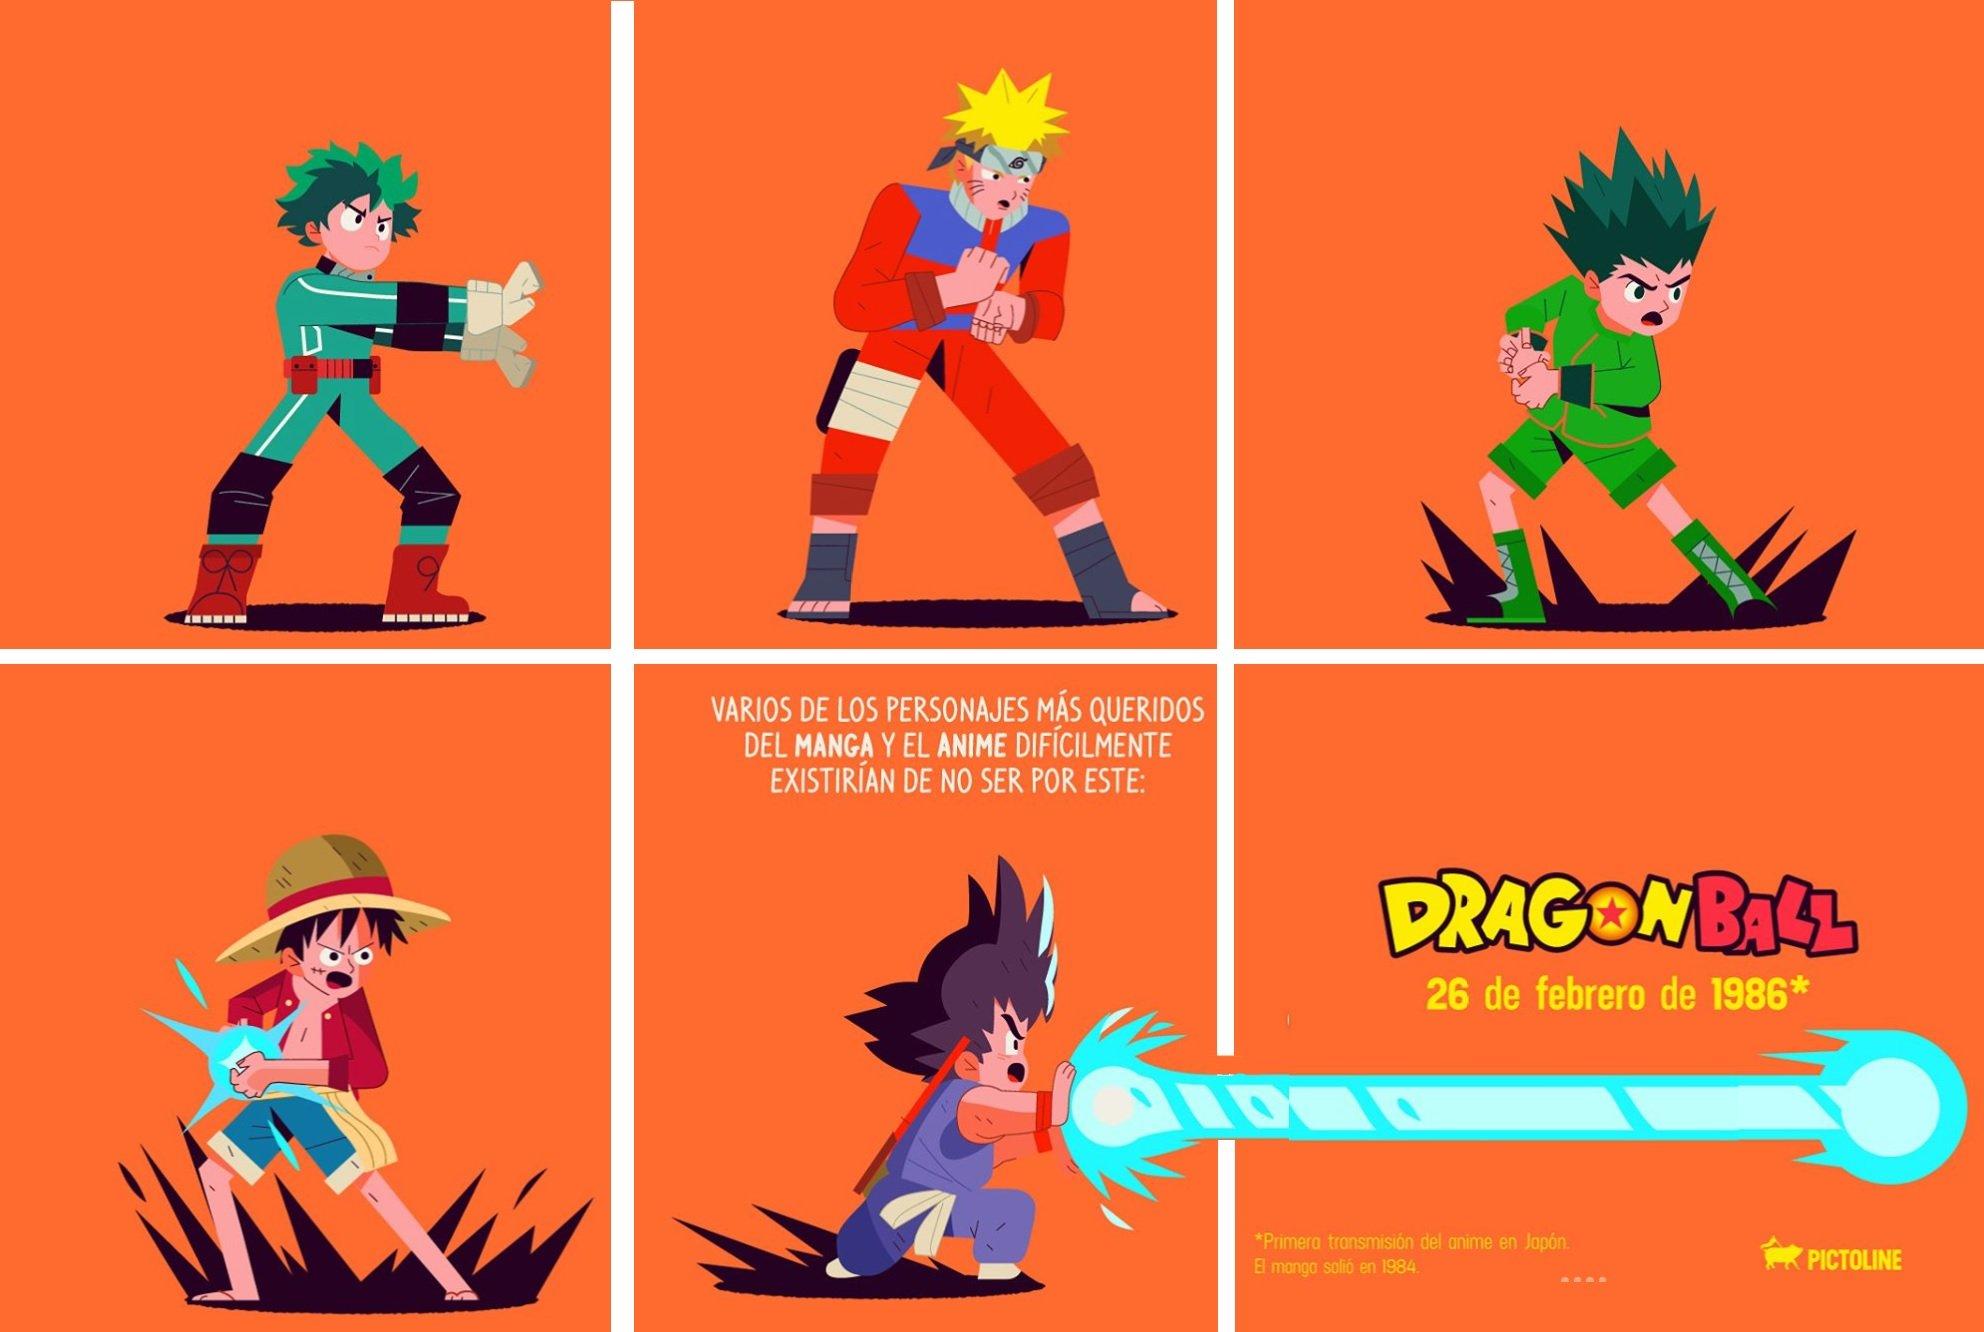 Personajes De Shonen Jump Celebran 33º Aniversario De Dragon